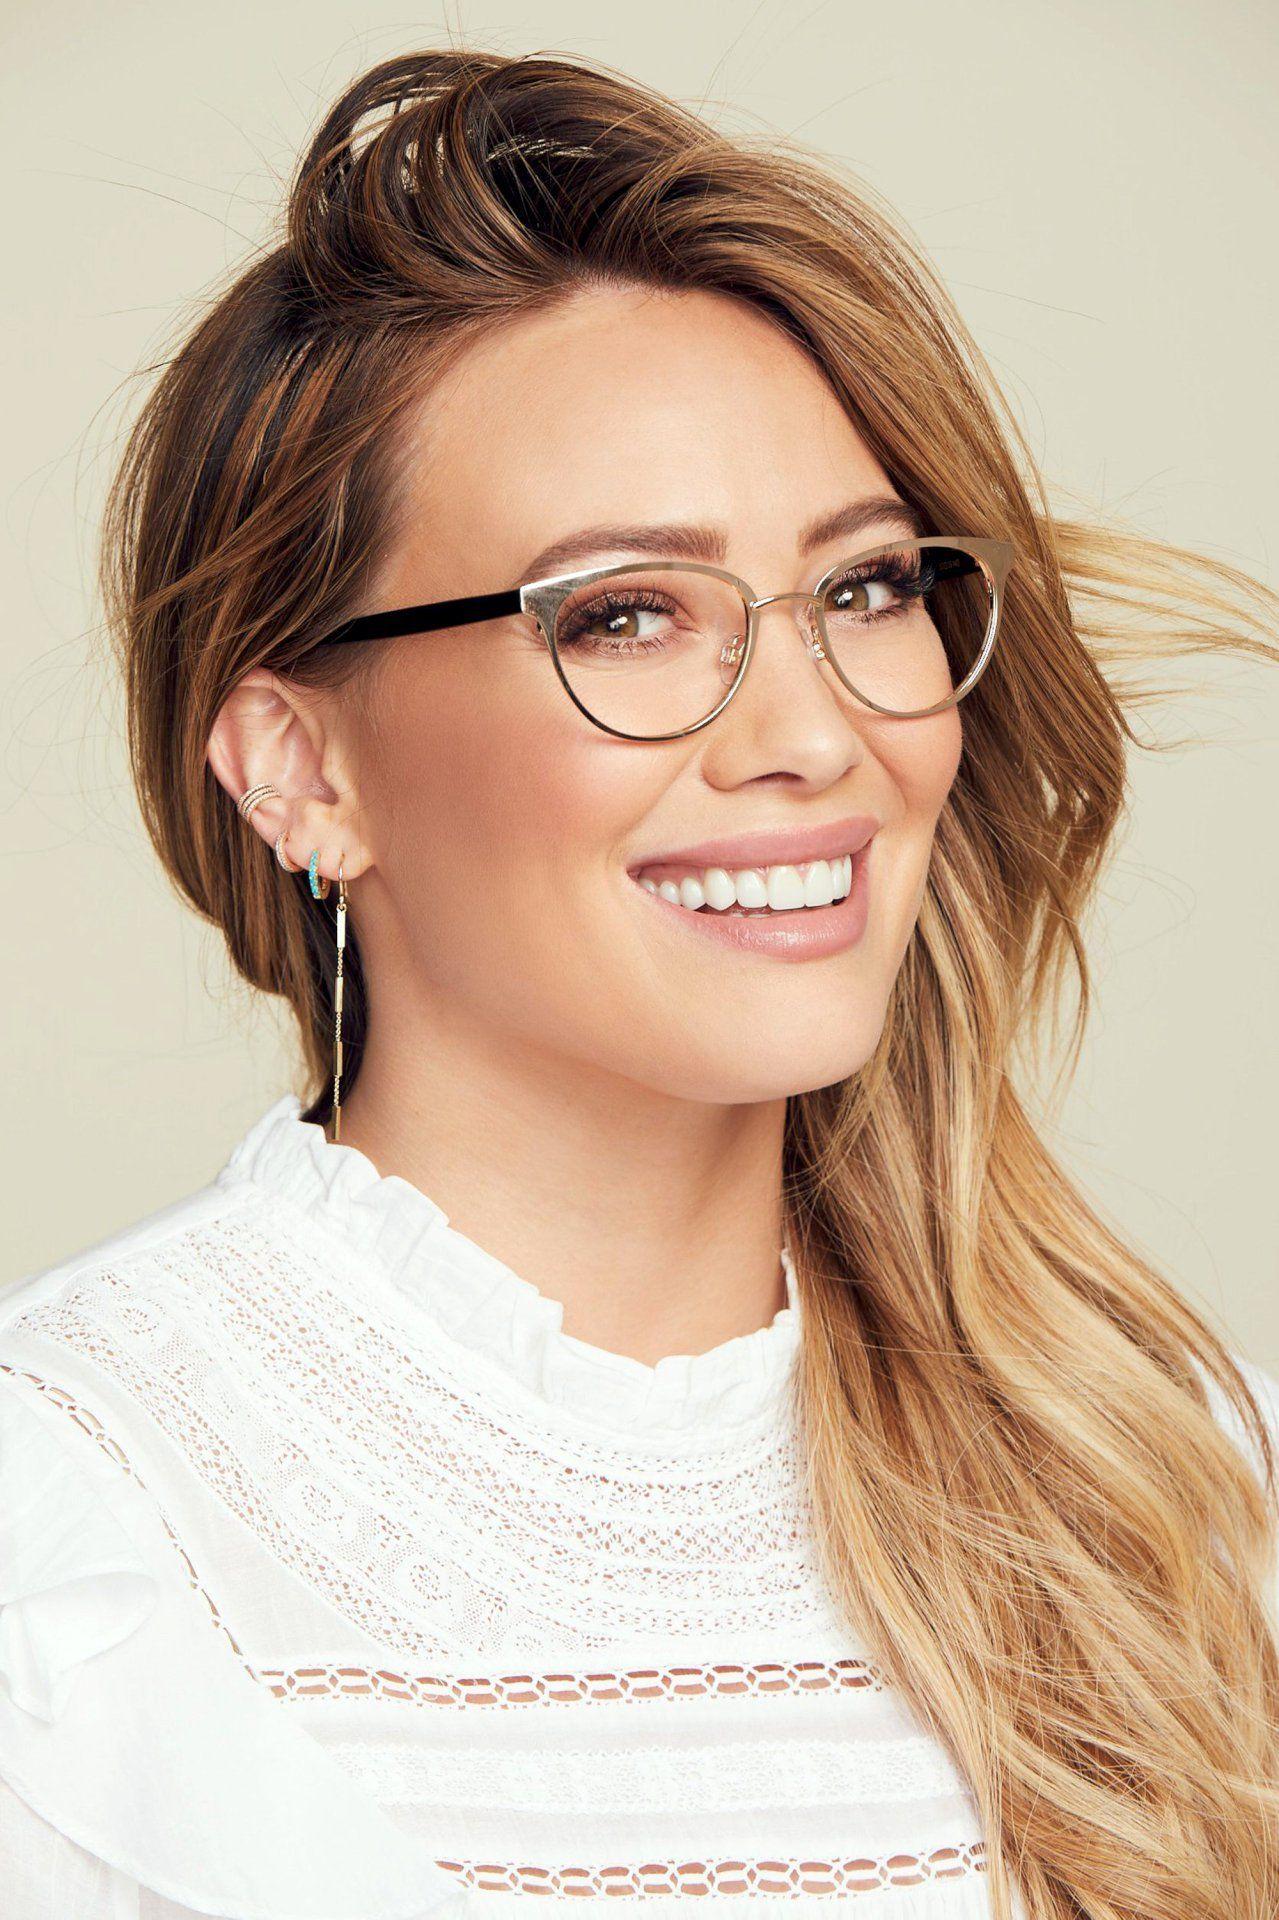 1c489537cb16c Love her glasses